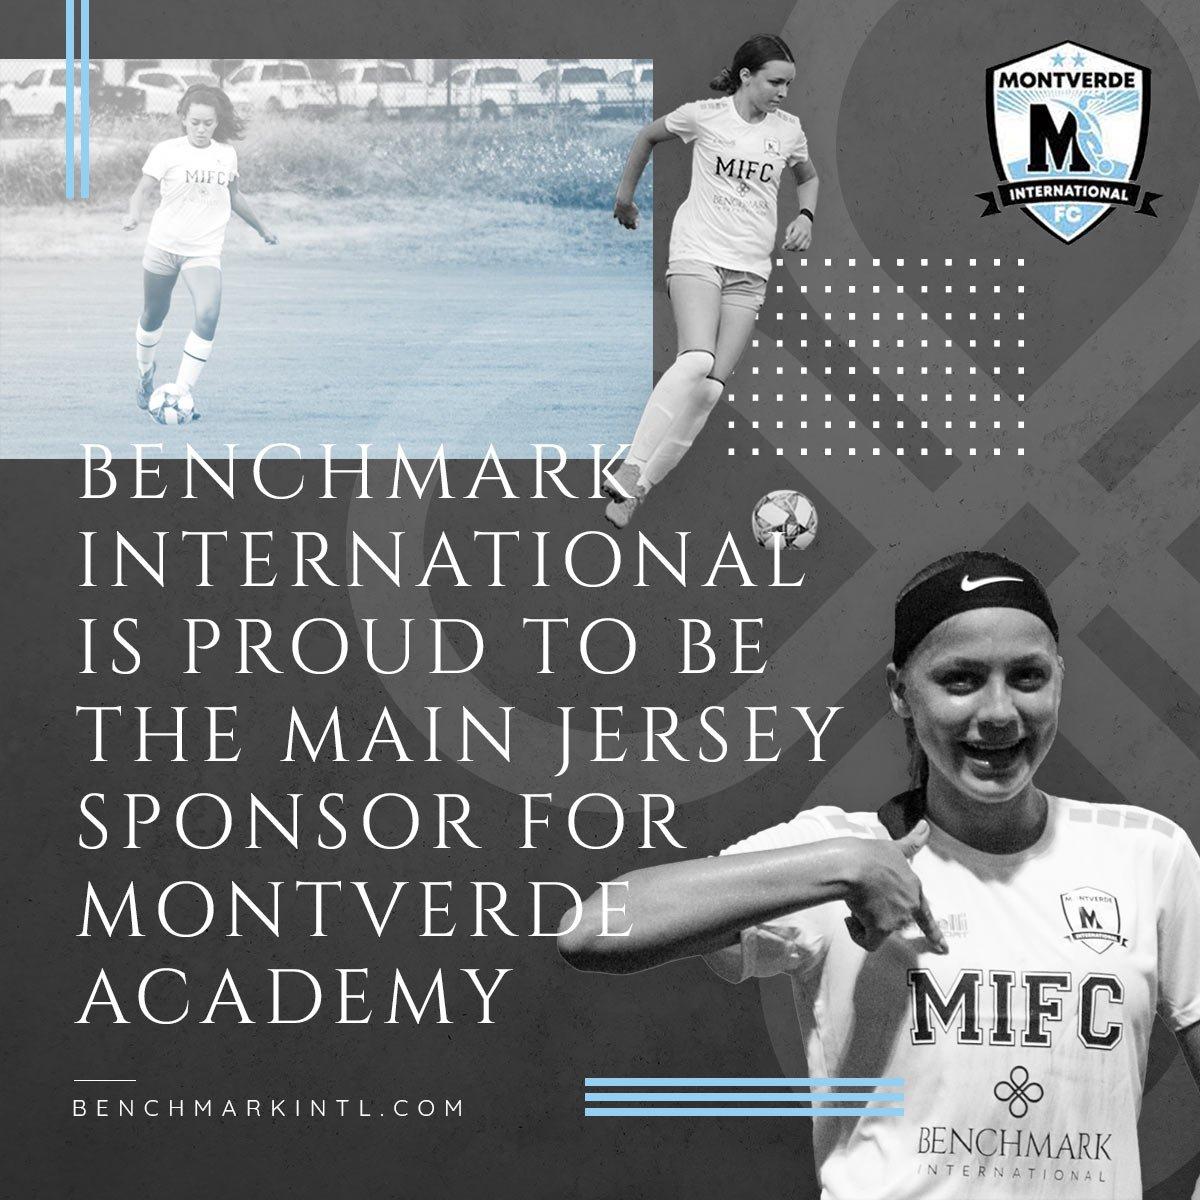 Benchmark_International_main_jersey_sponsor_for_Montverde_Academy_Social(6)